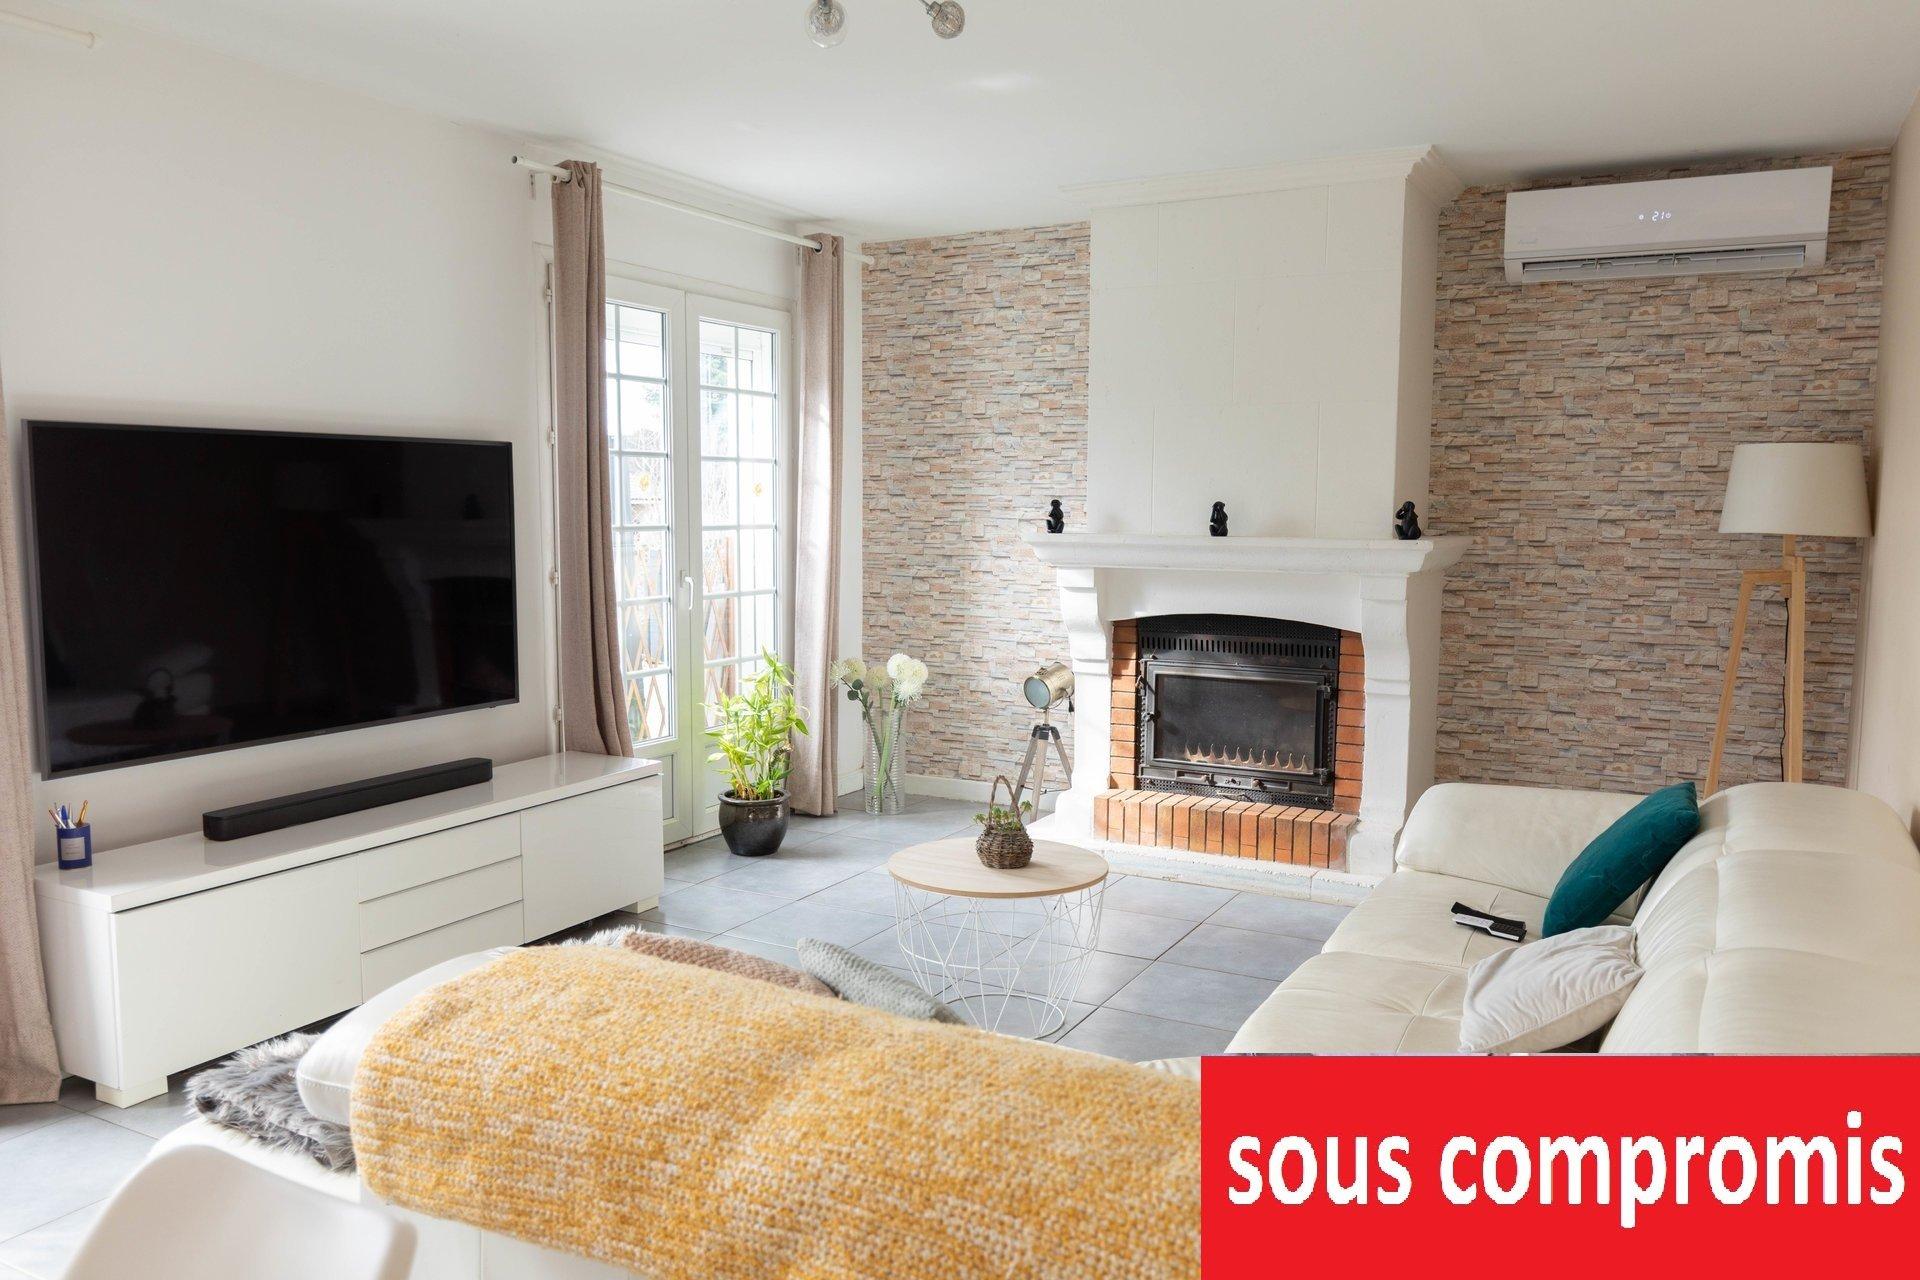 Vente Villa - Les Tourrettes